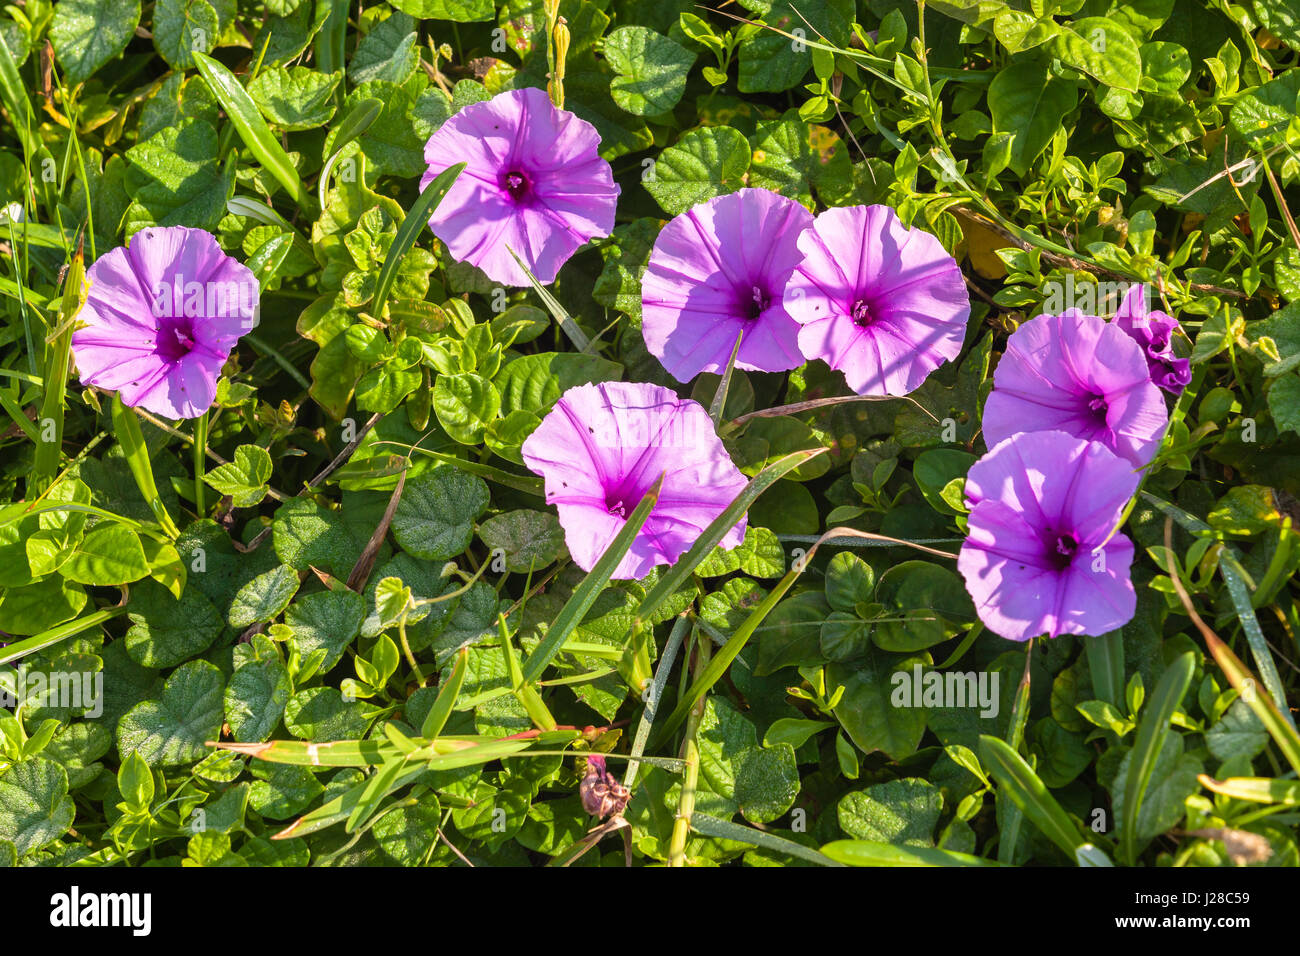 Shrubs with purple flowers pictures - Flora Purple Flowers And Shrubs Closeup Beach Coastline